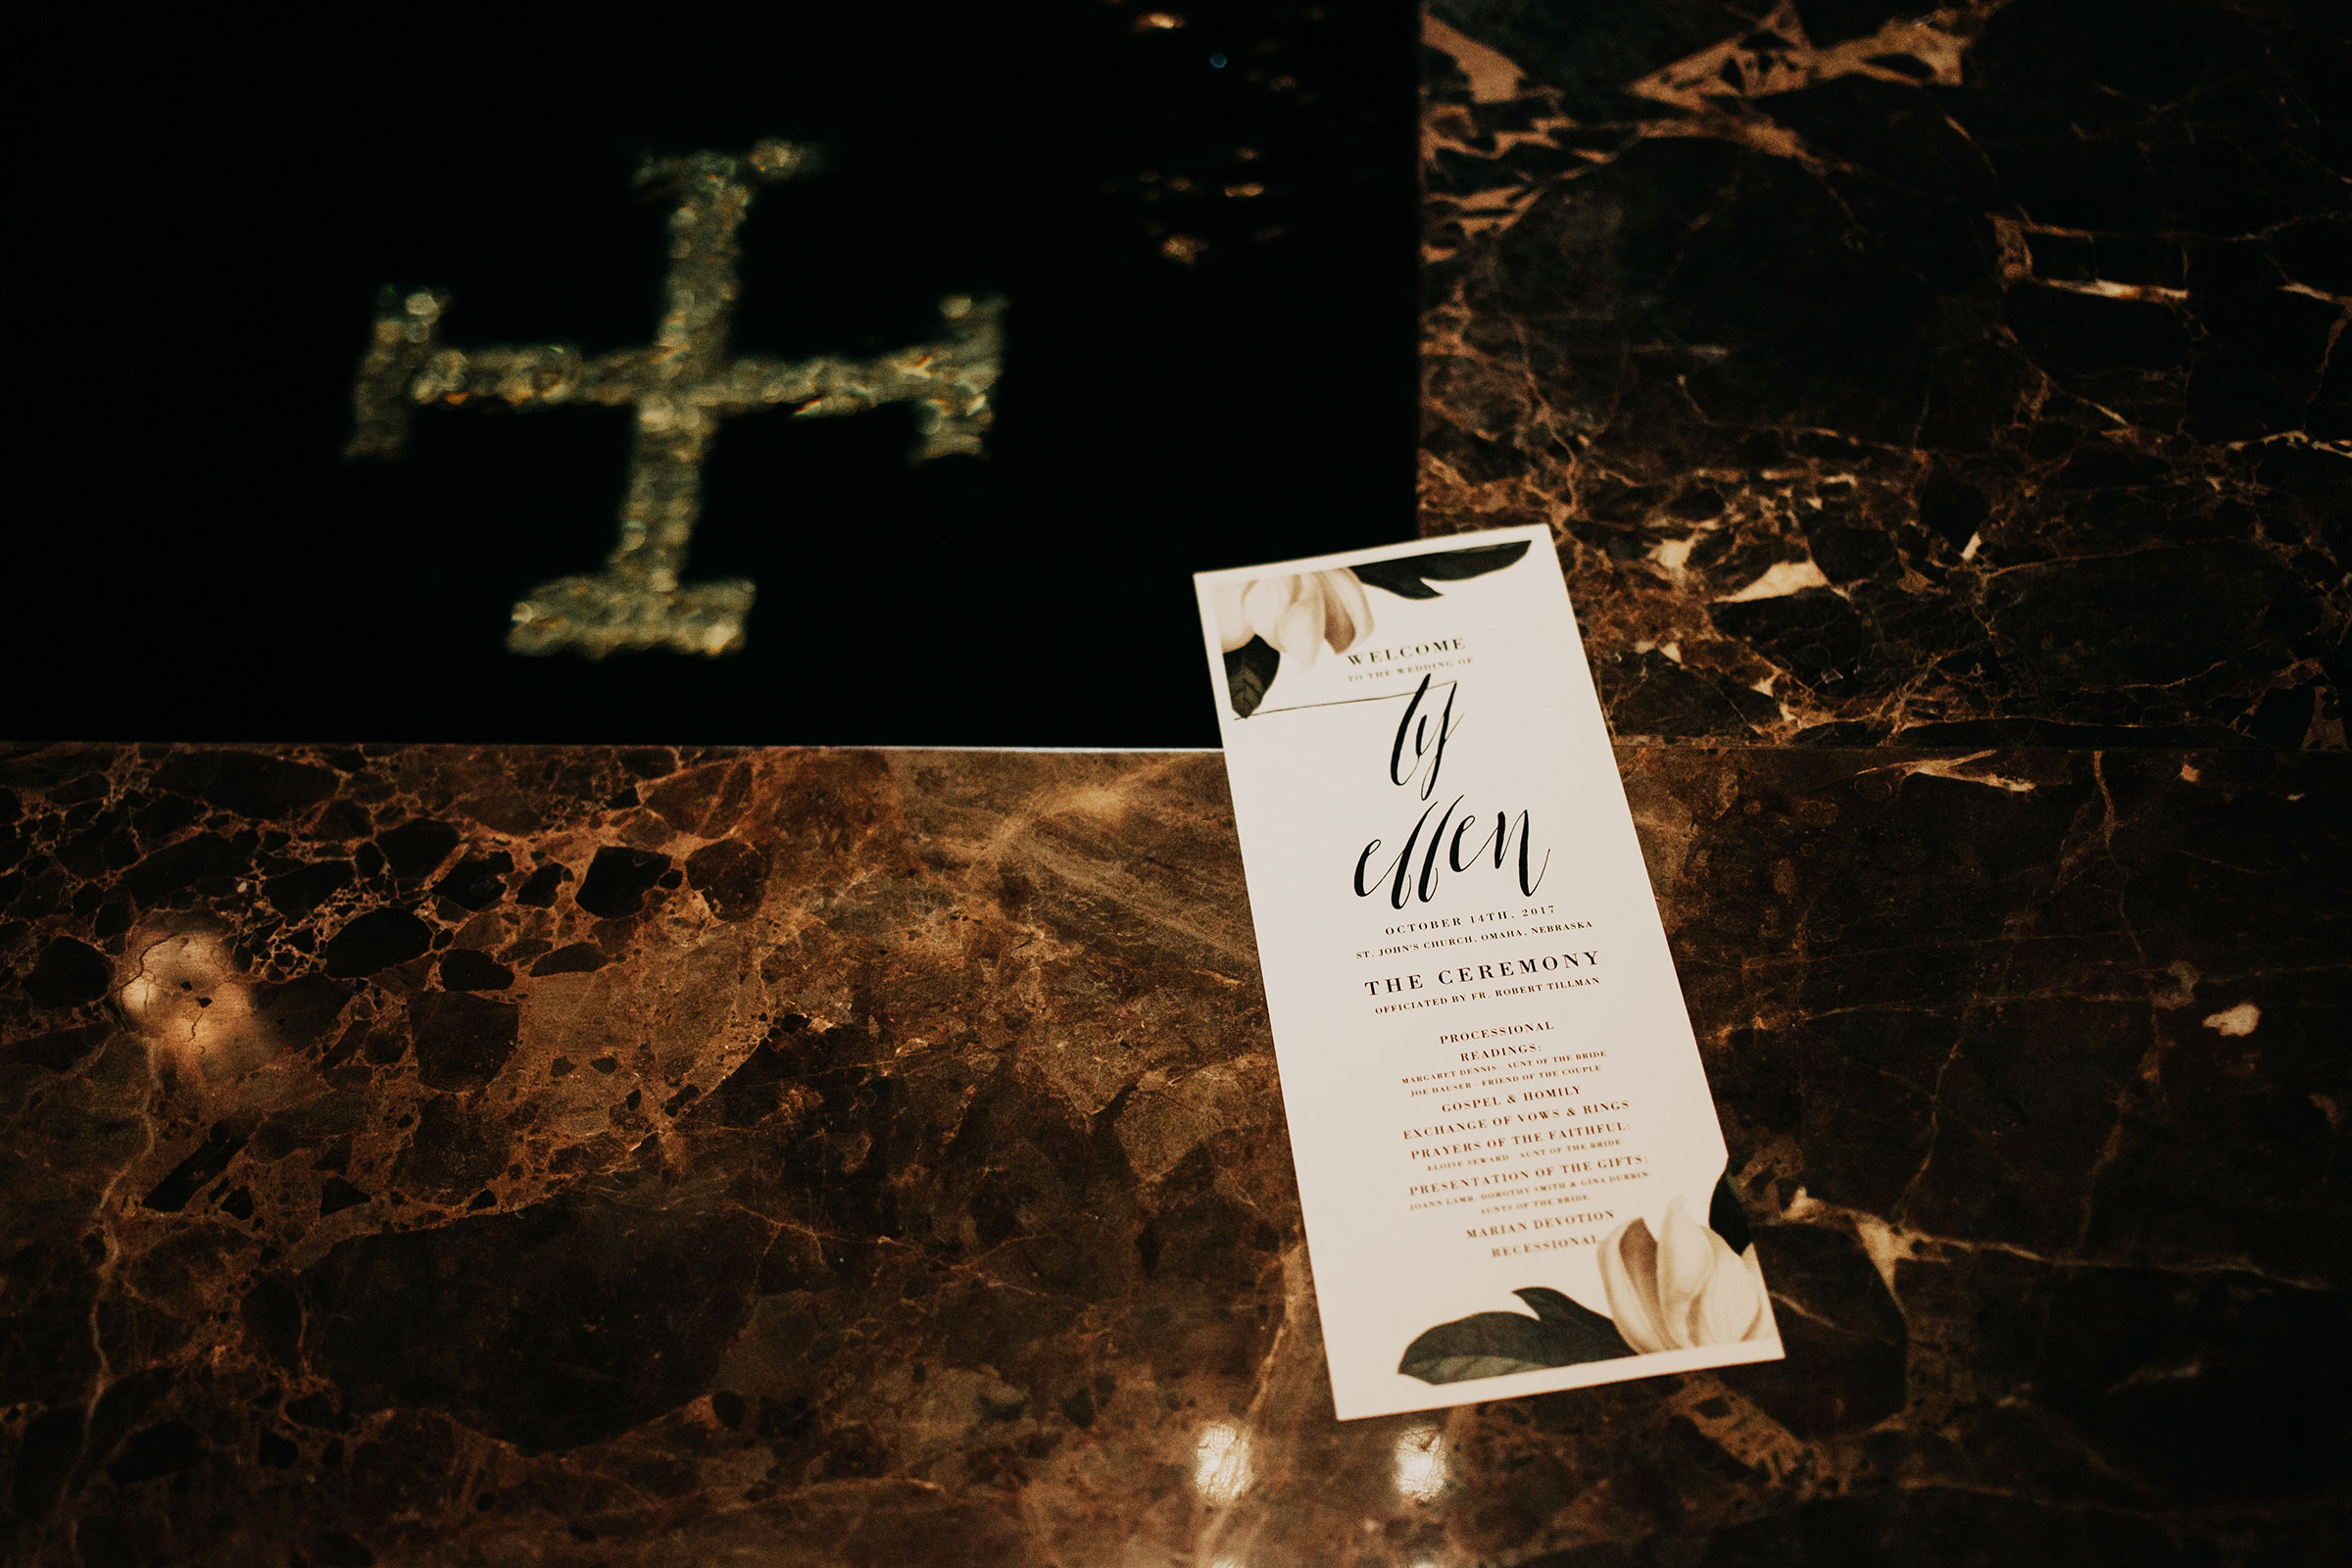 wedding-brochure-for-ceremony-st-johns-church-at-creighton-omaha-nebraska-raelyn-ramey-photography.jpg